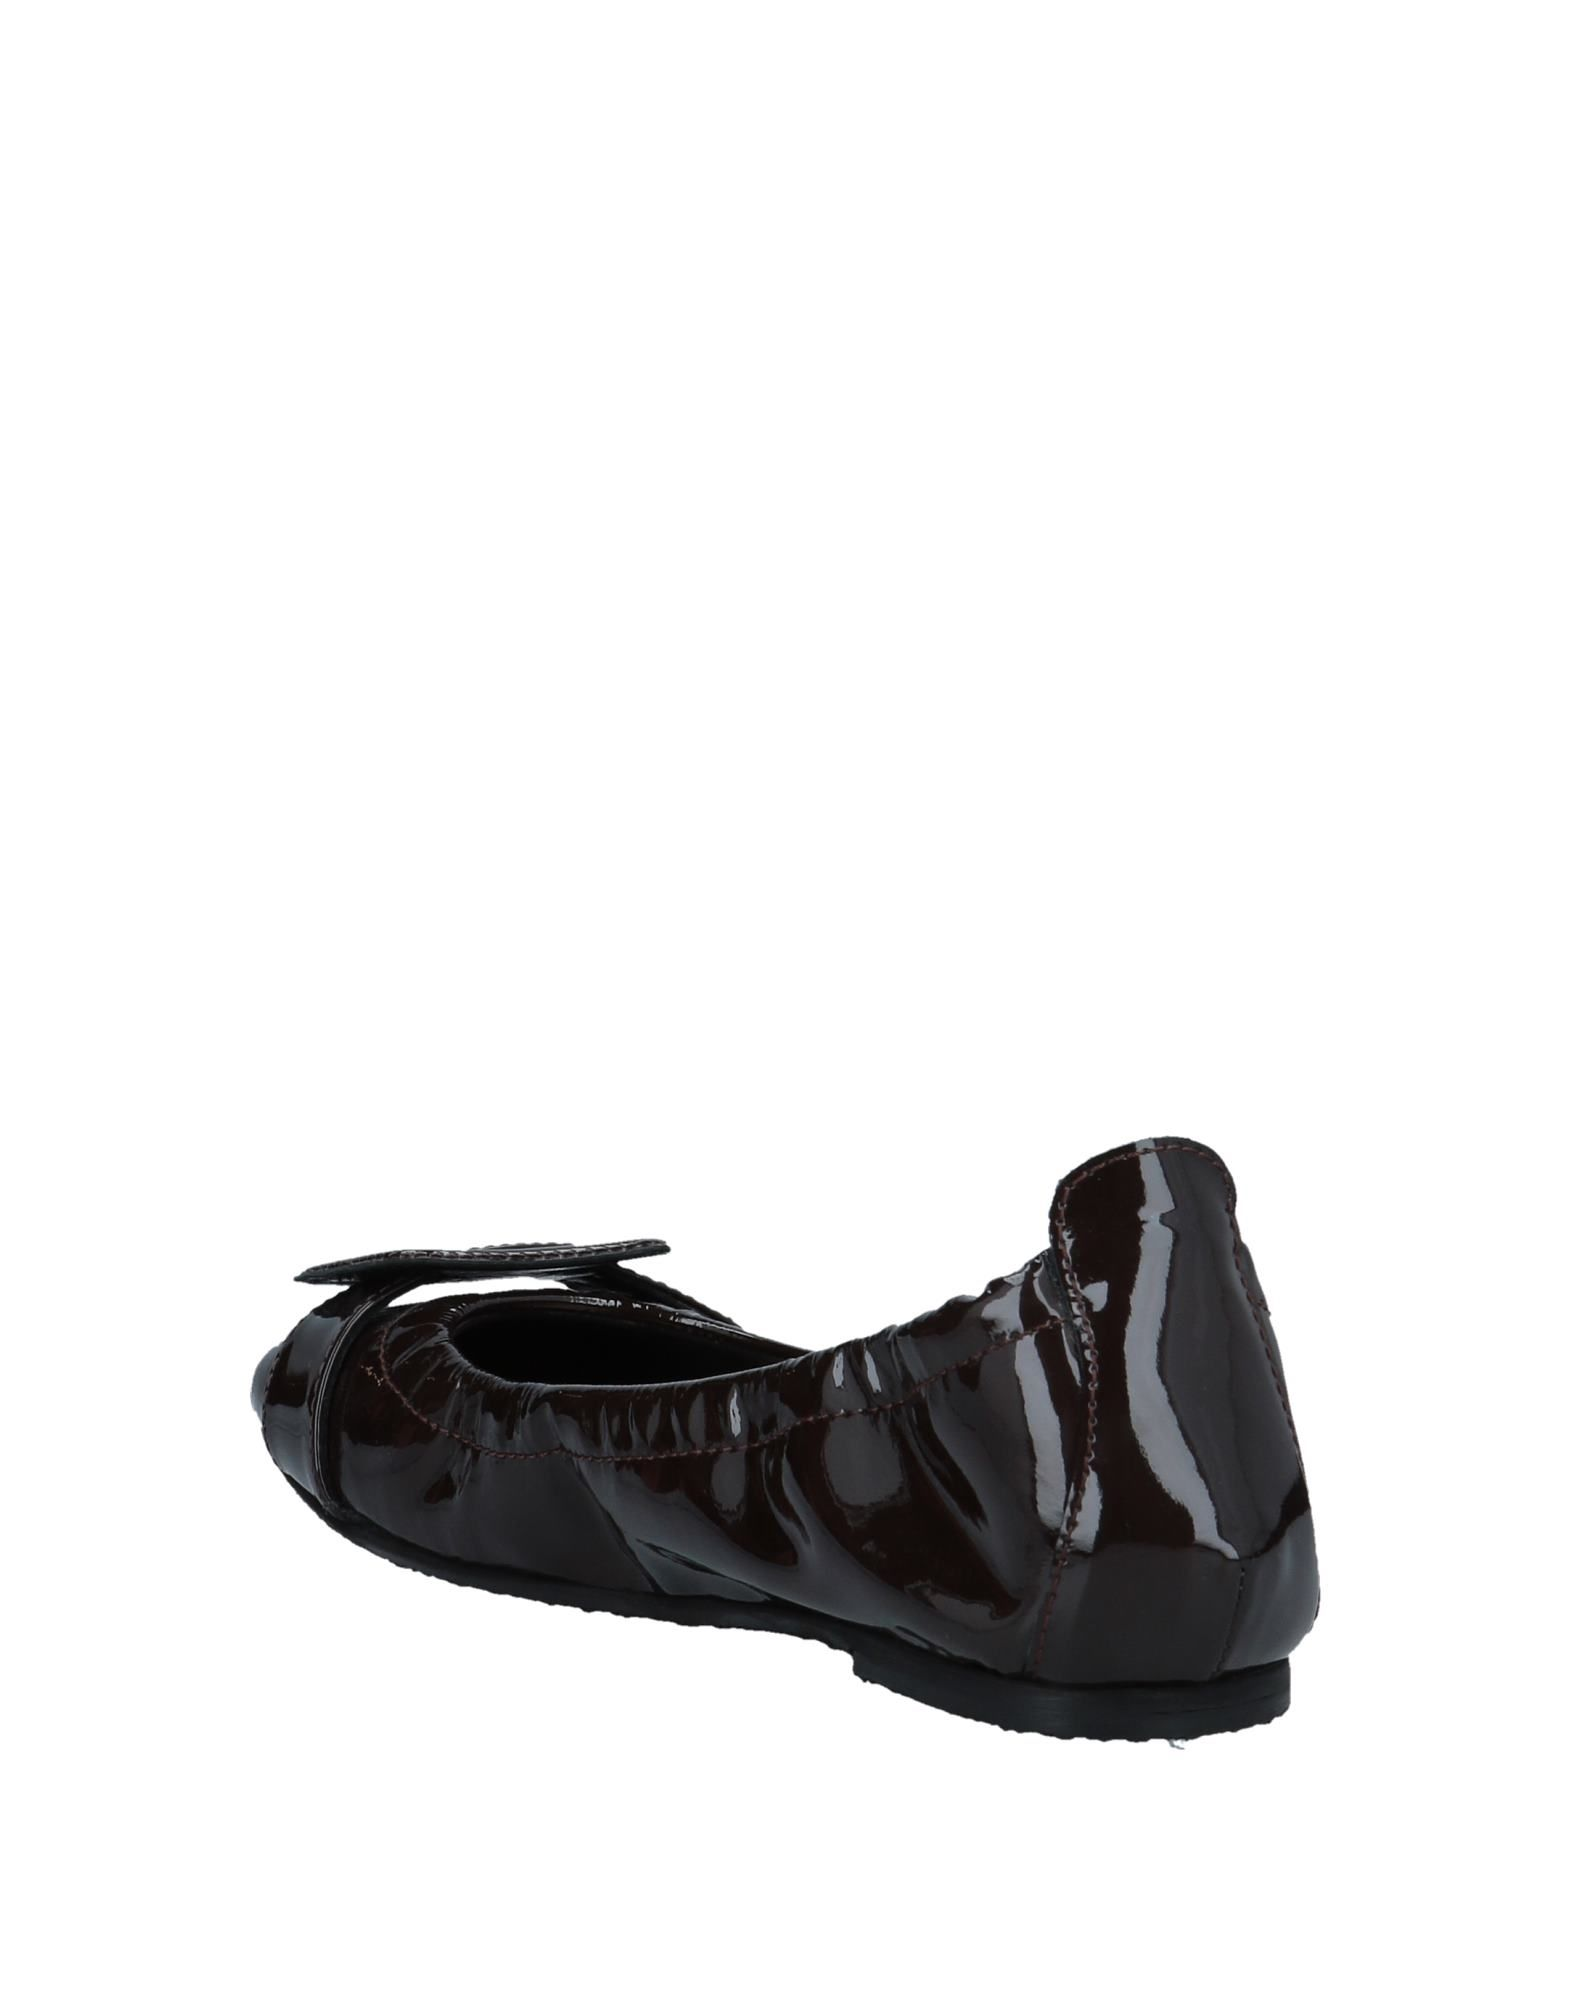 Betti Oliva Ballerinas Damen  Schuhe 11548364SG Gute Qualität beliebte Schuhe  deabd6